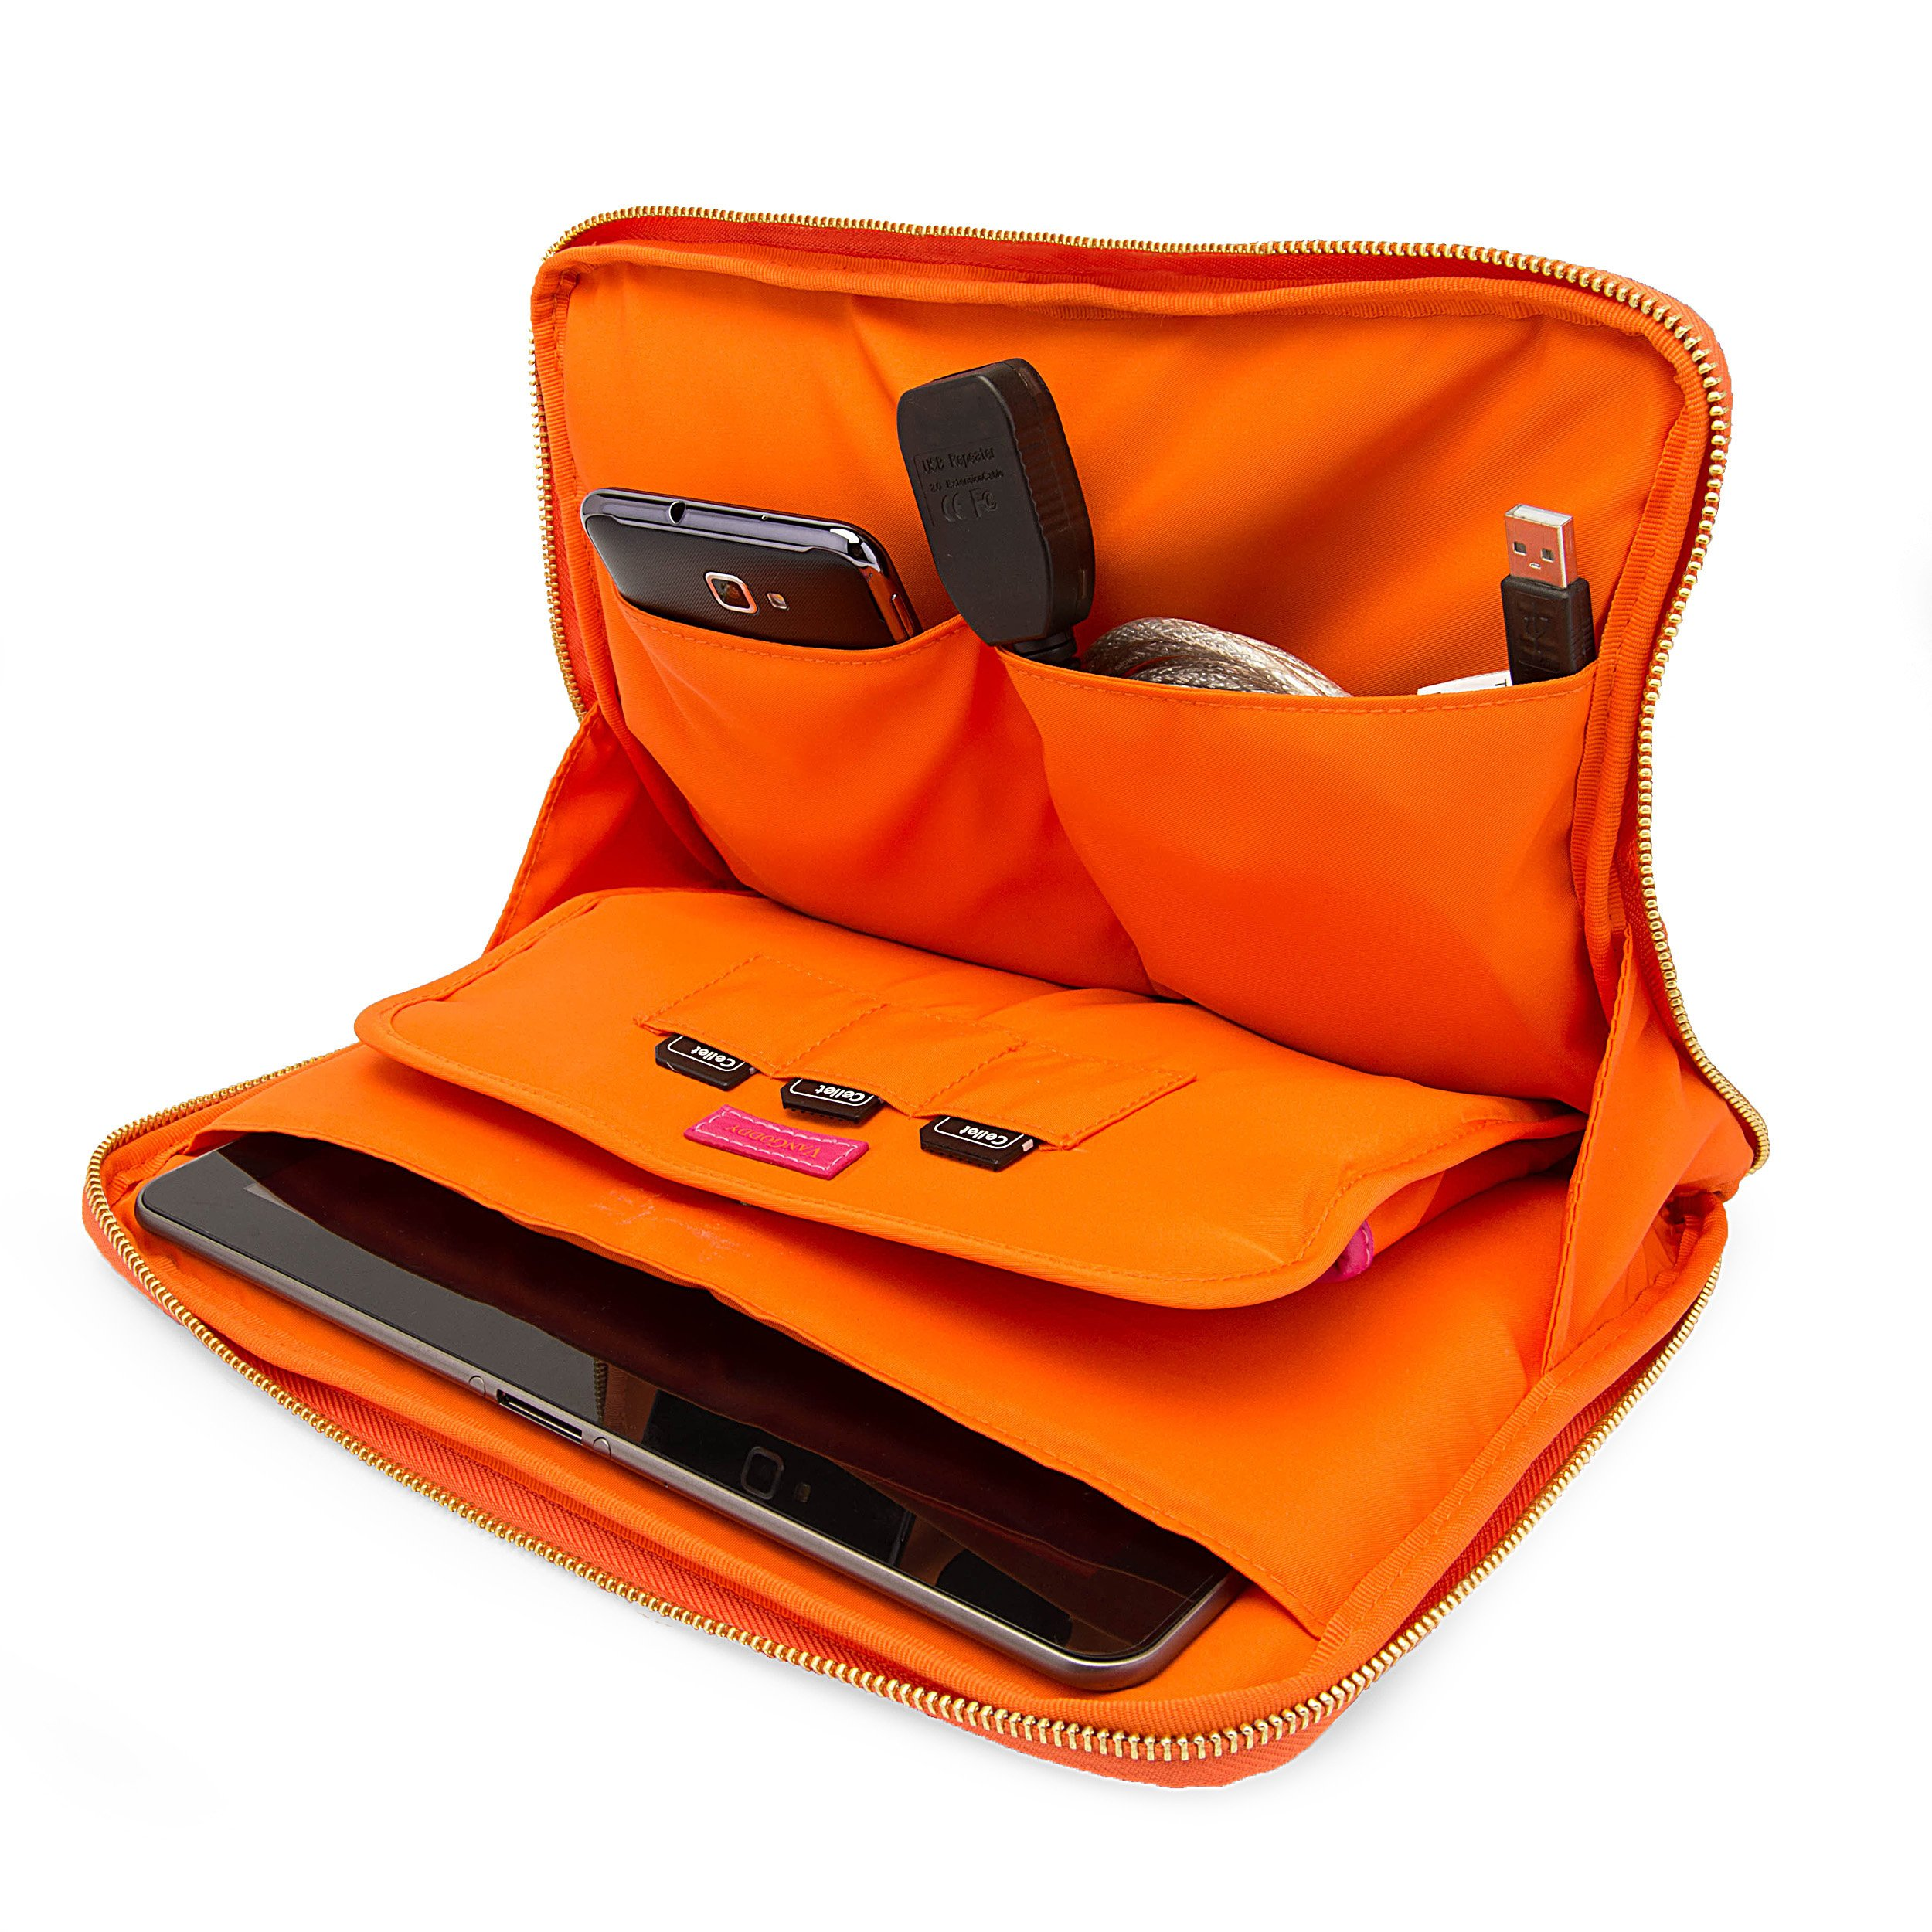 Travel Leatherette Sleeve For Samsung Galaxy Tab S 10.5 / Galaxy Tab 4 10.1 / Galaxy Tab Pro 10.1 + Bluetooth Speaker by VangoddyCase (Image #4)